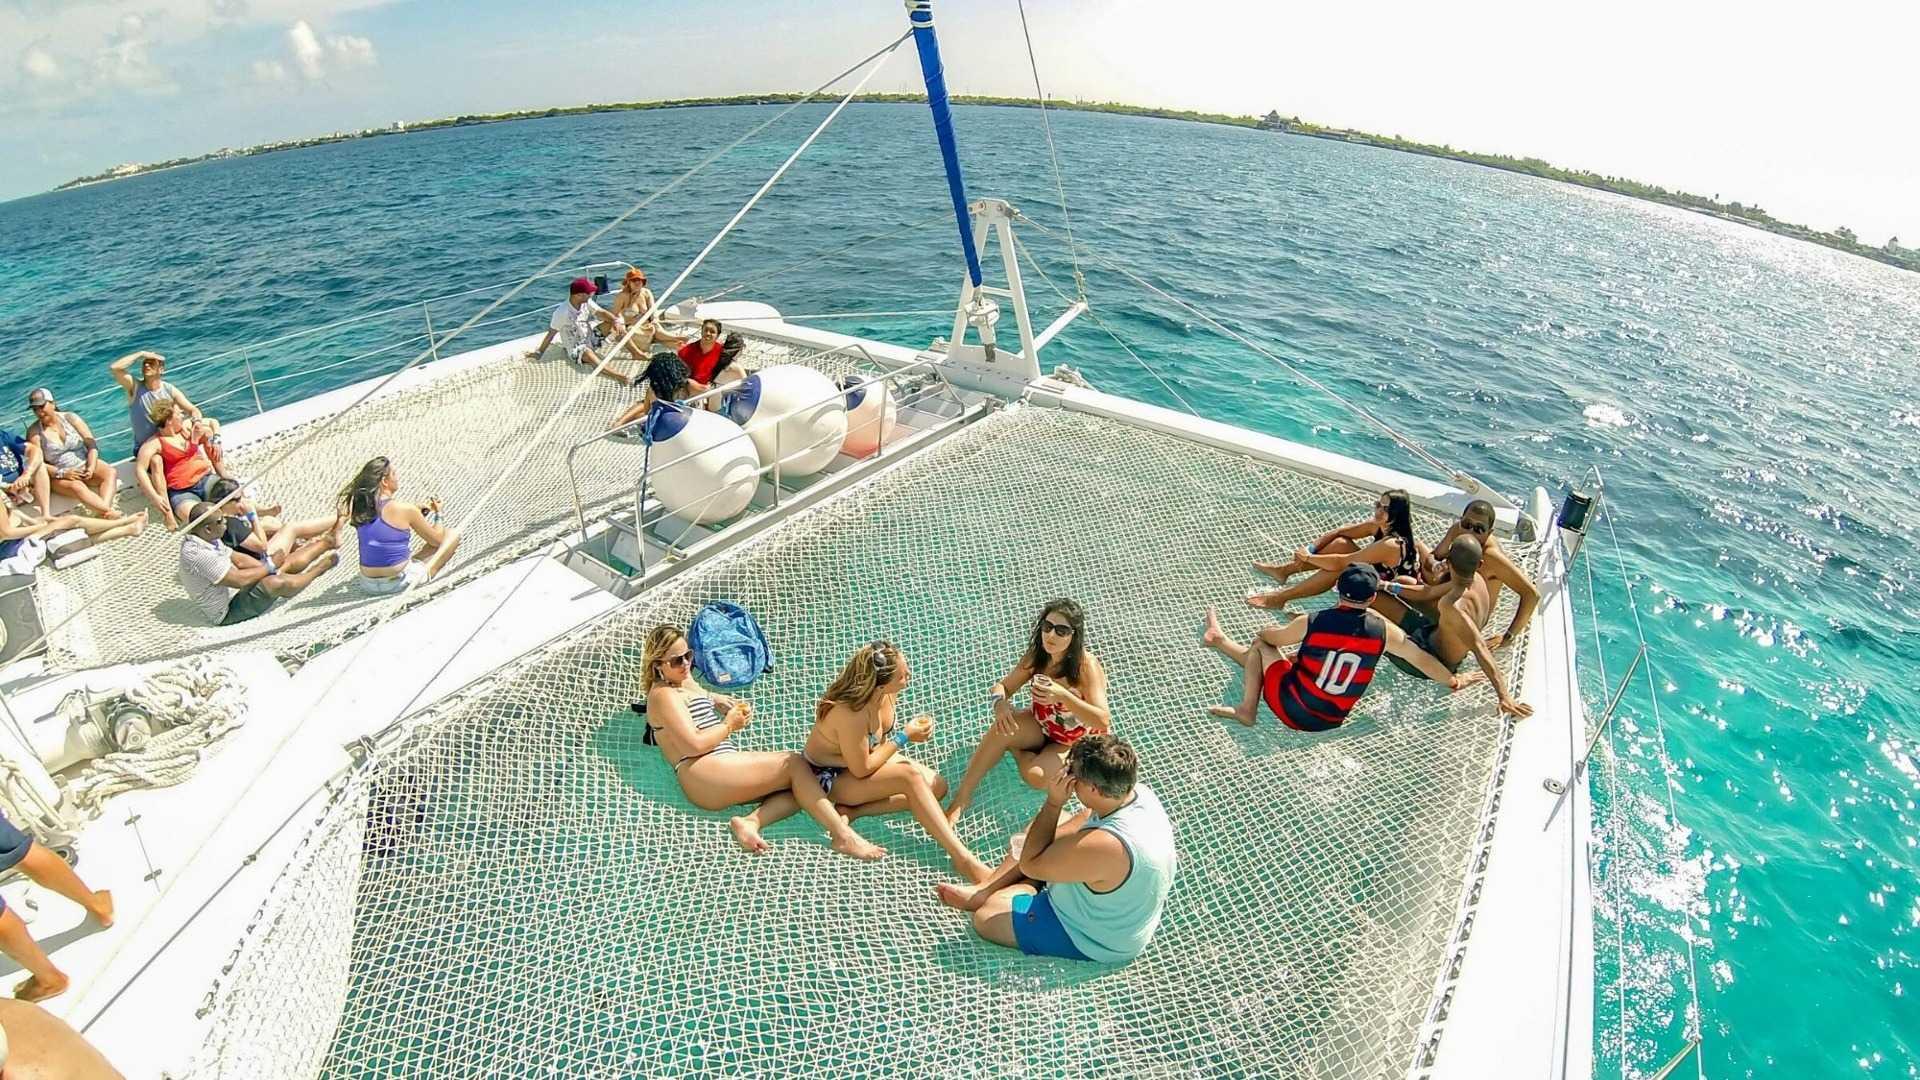 4 - LowRes - Private Isla Mujeres tour in catamaran - Sea Passion I II - Cancun Sailing